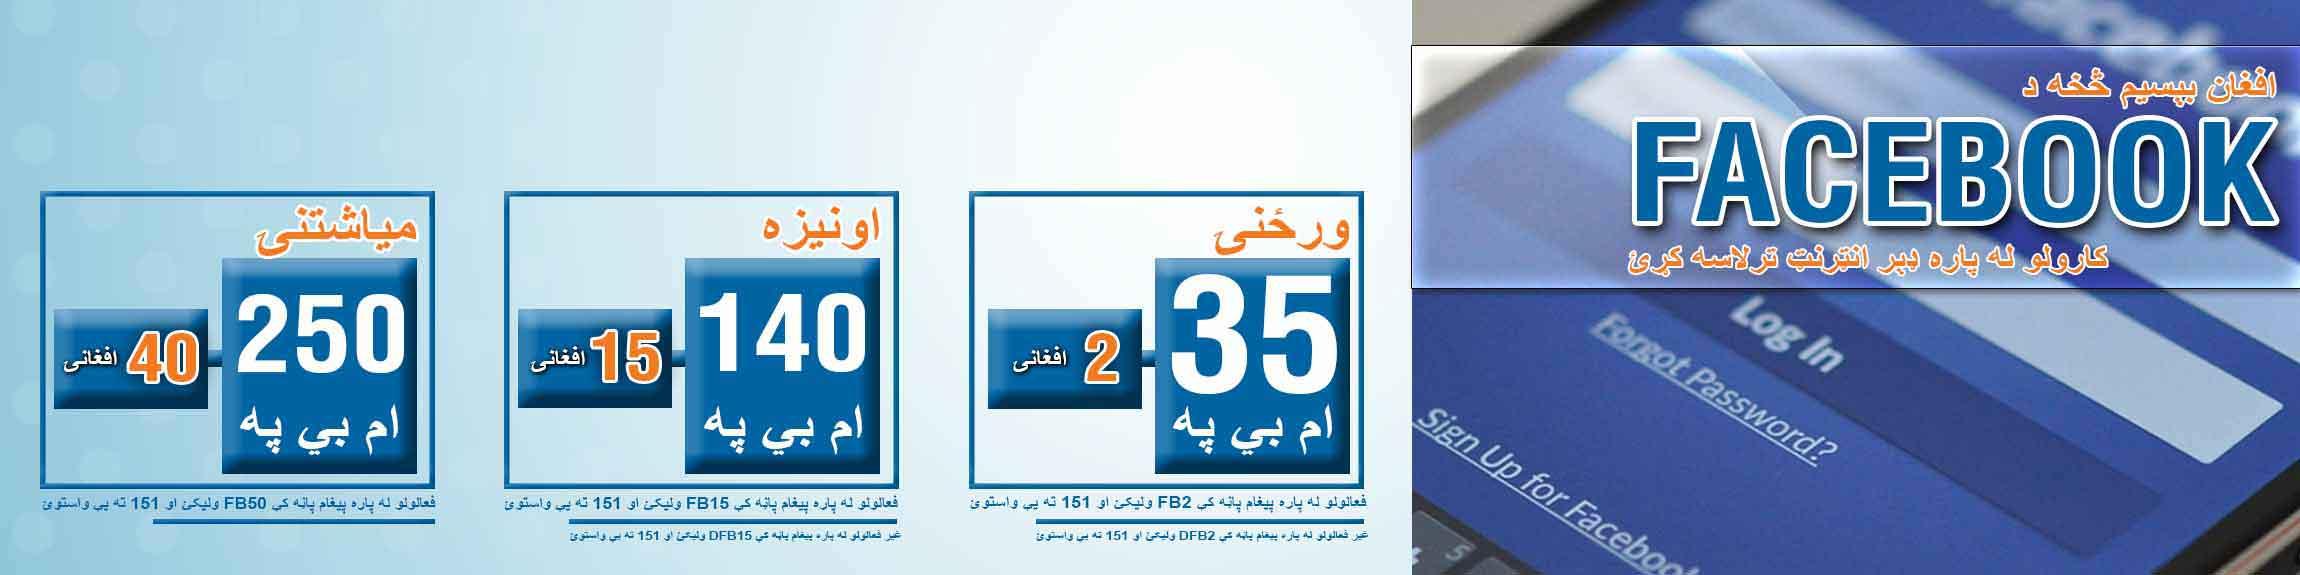 fb-pack-Pashto